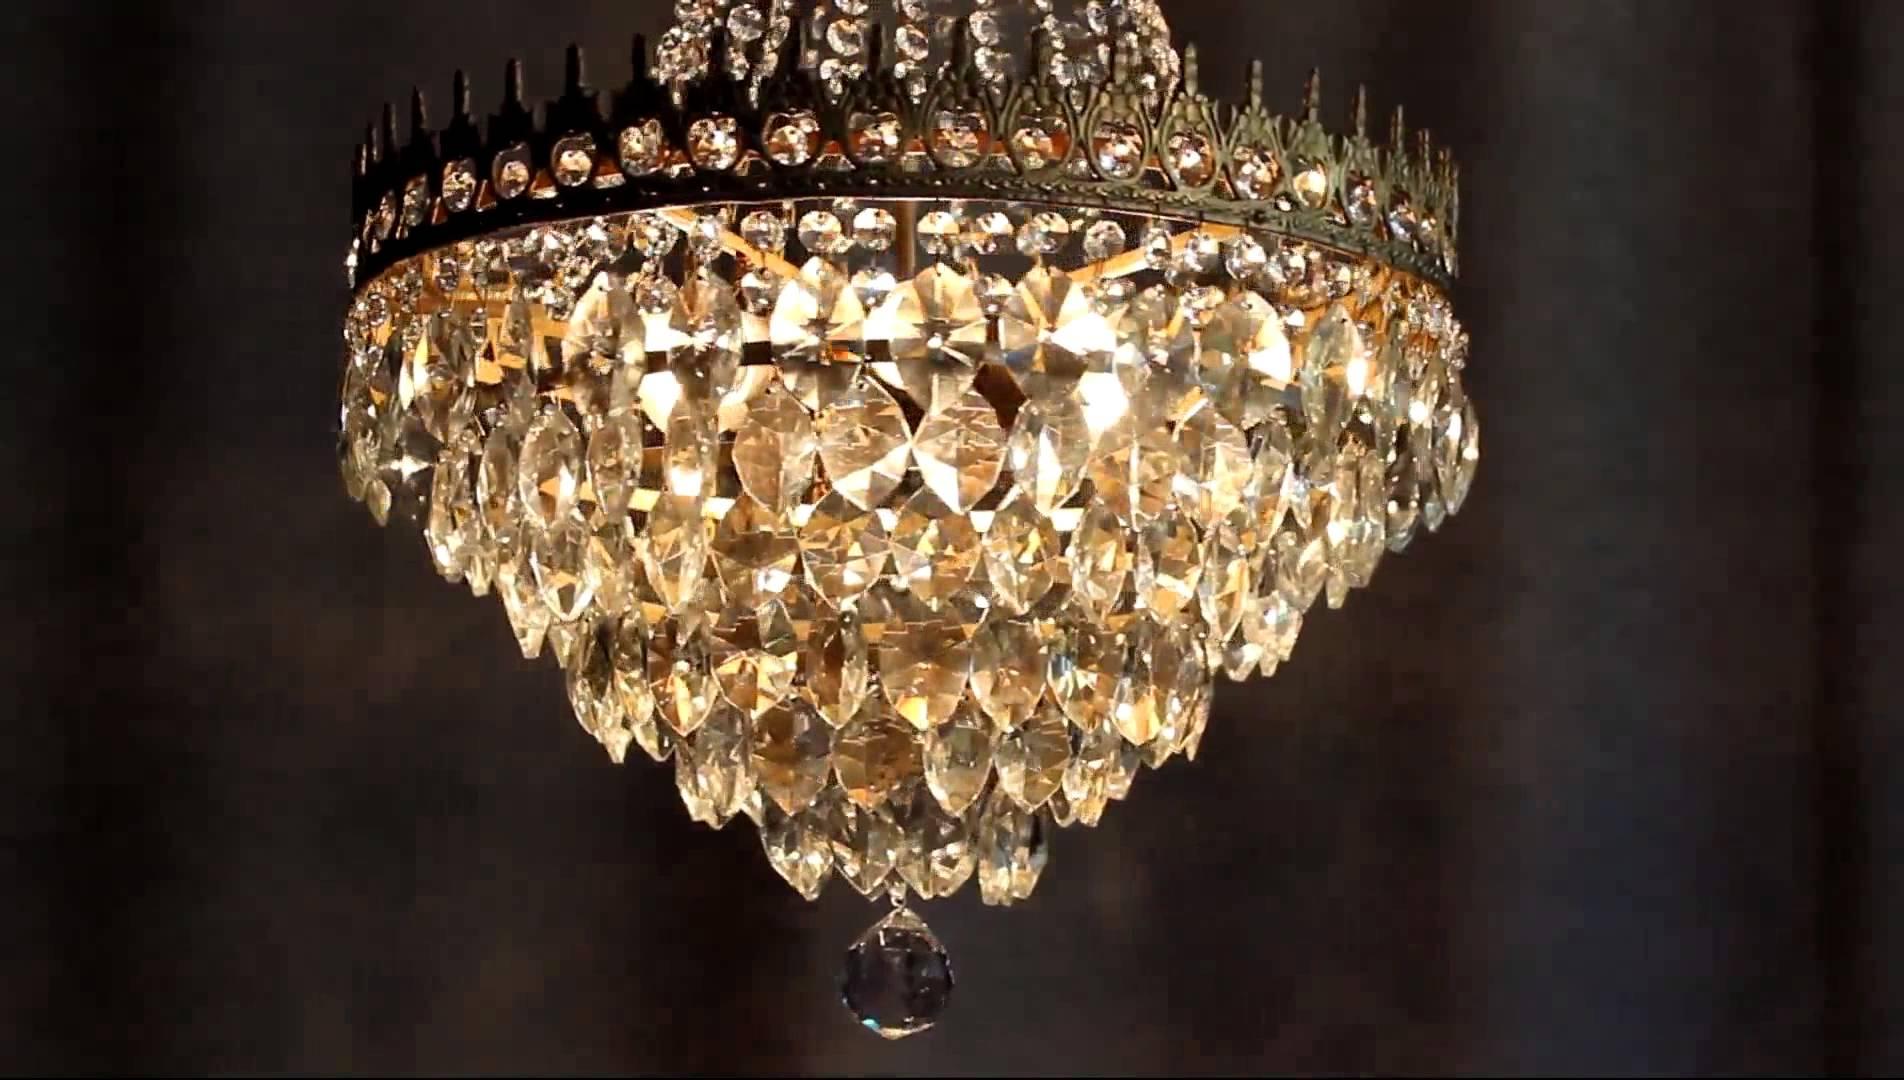 Huge Antique Luster Crystal Candelabra Chandelier Lighting Brass In Huge Chandeliers (Image 8 of 15)